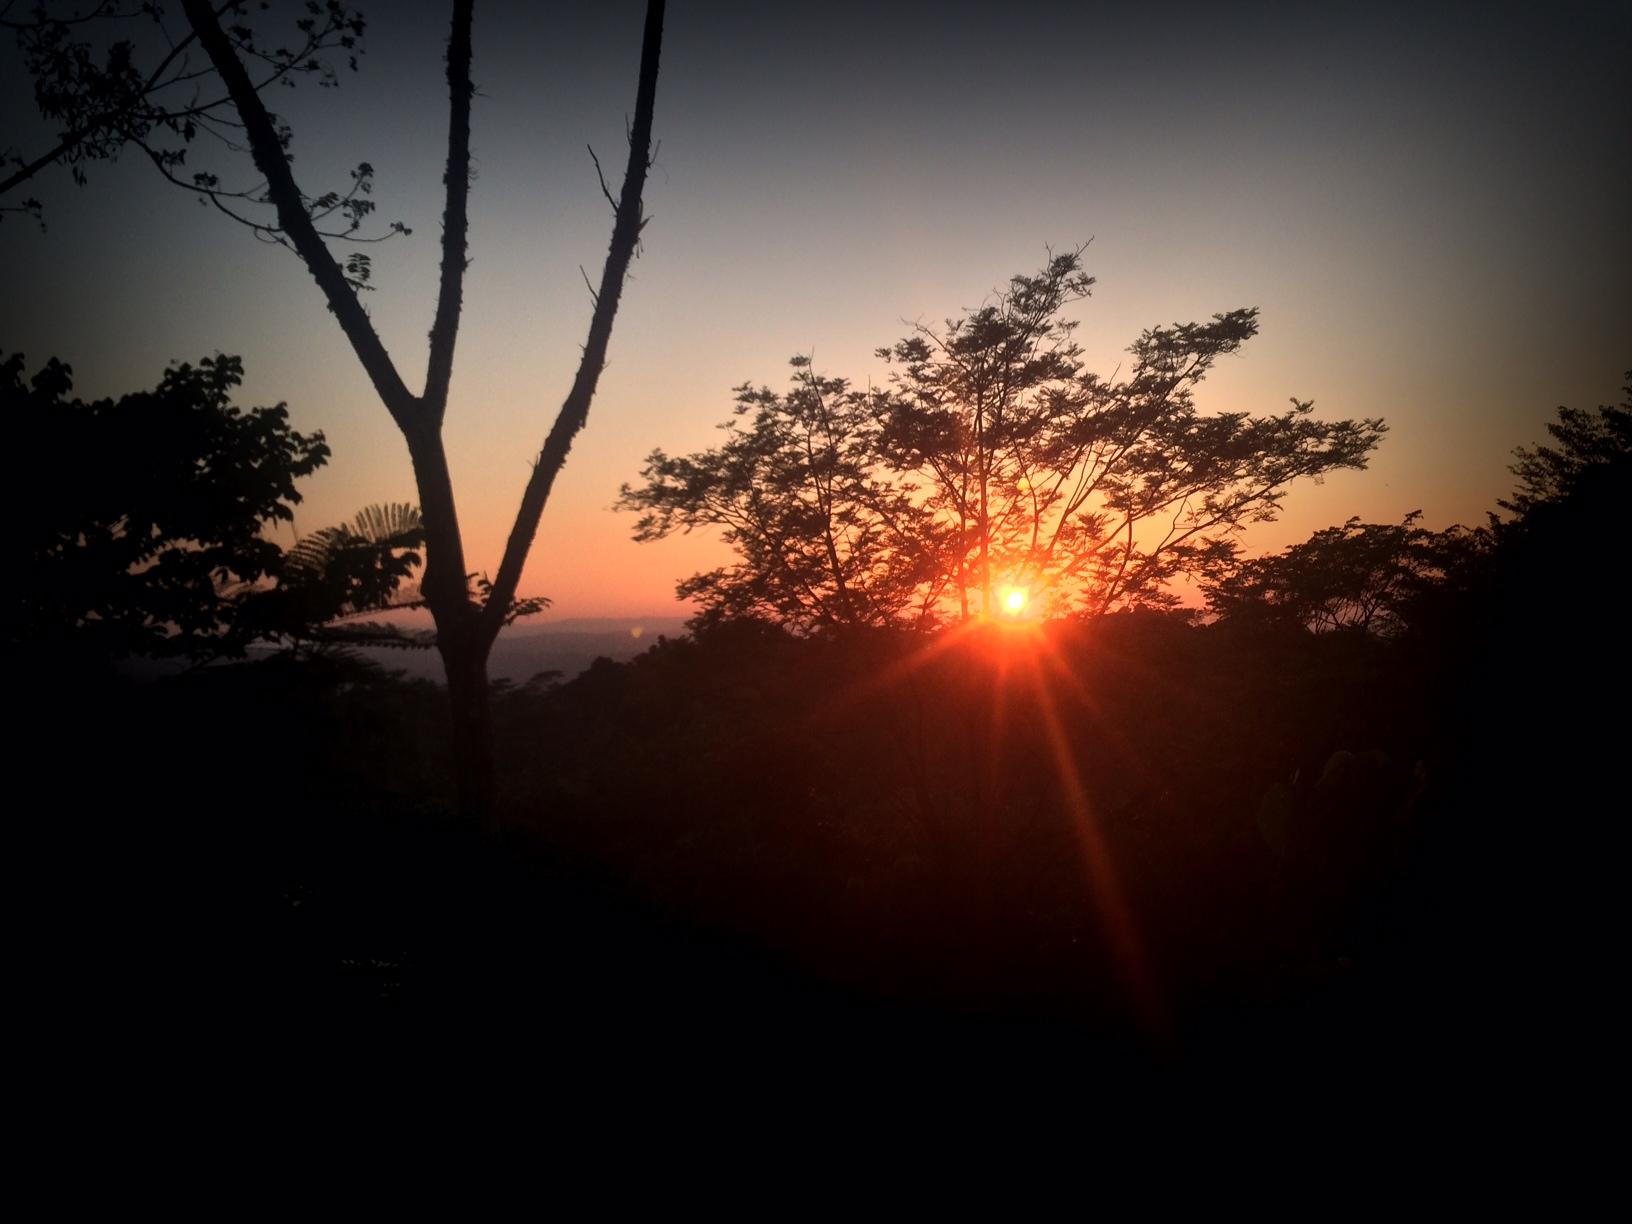 Sky-lounge Sunset